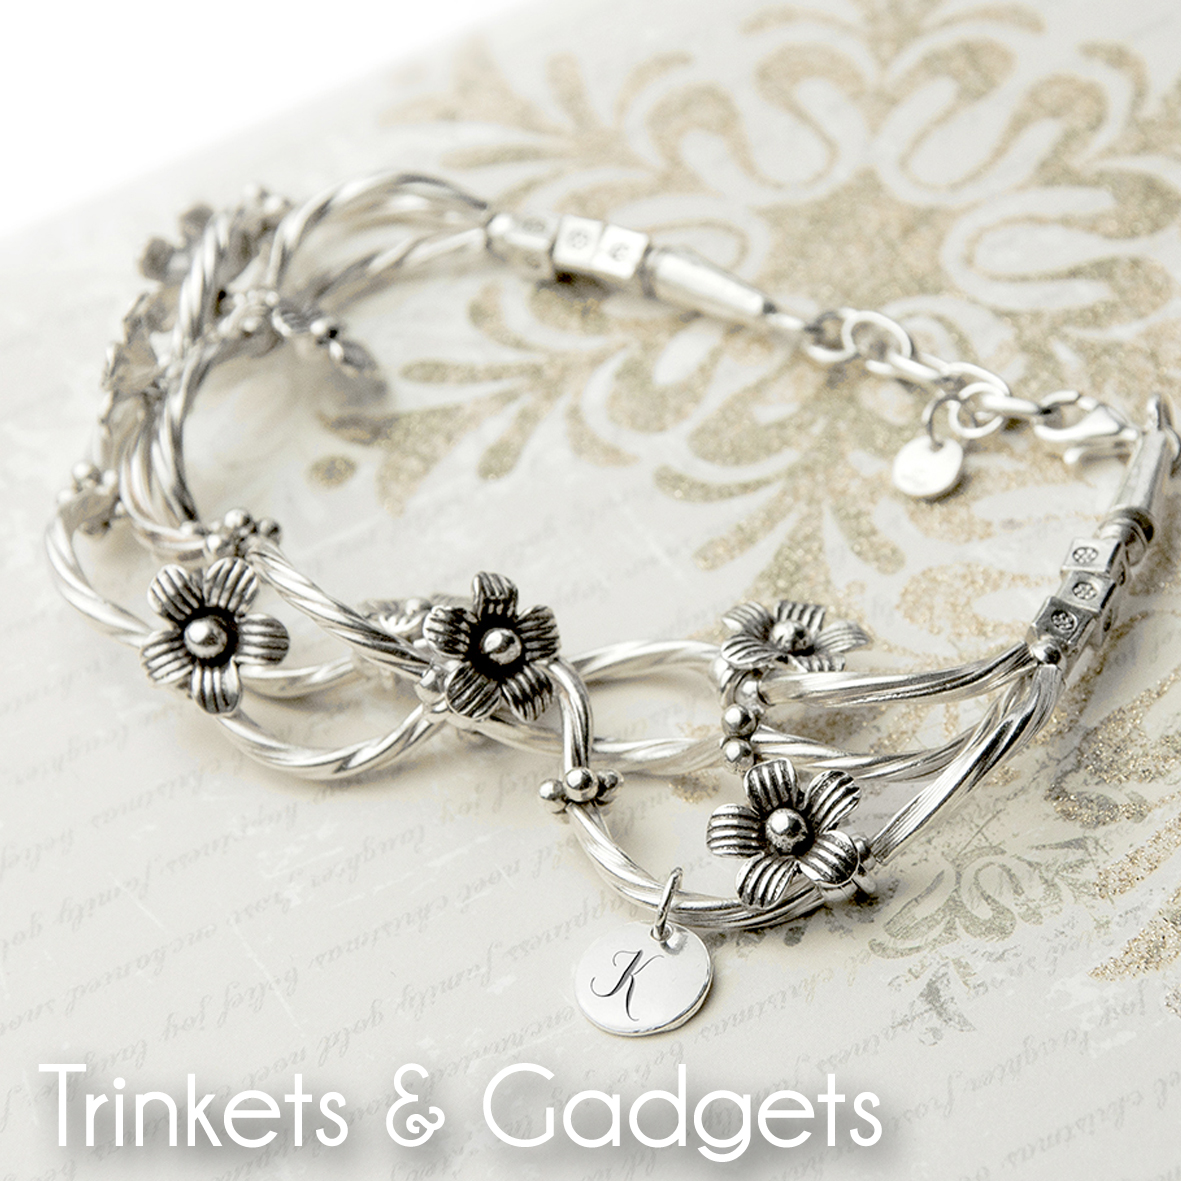 Trinkets & Gadgets